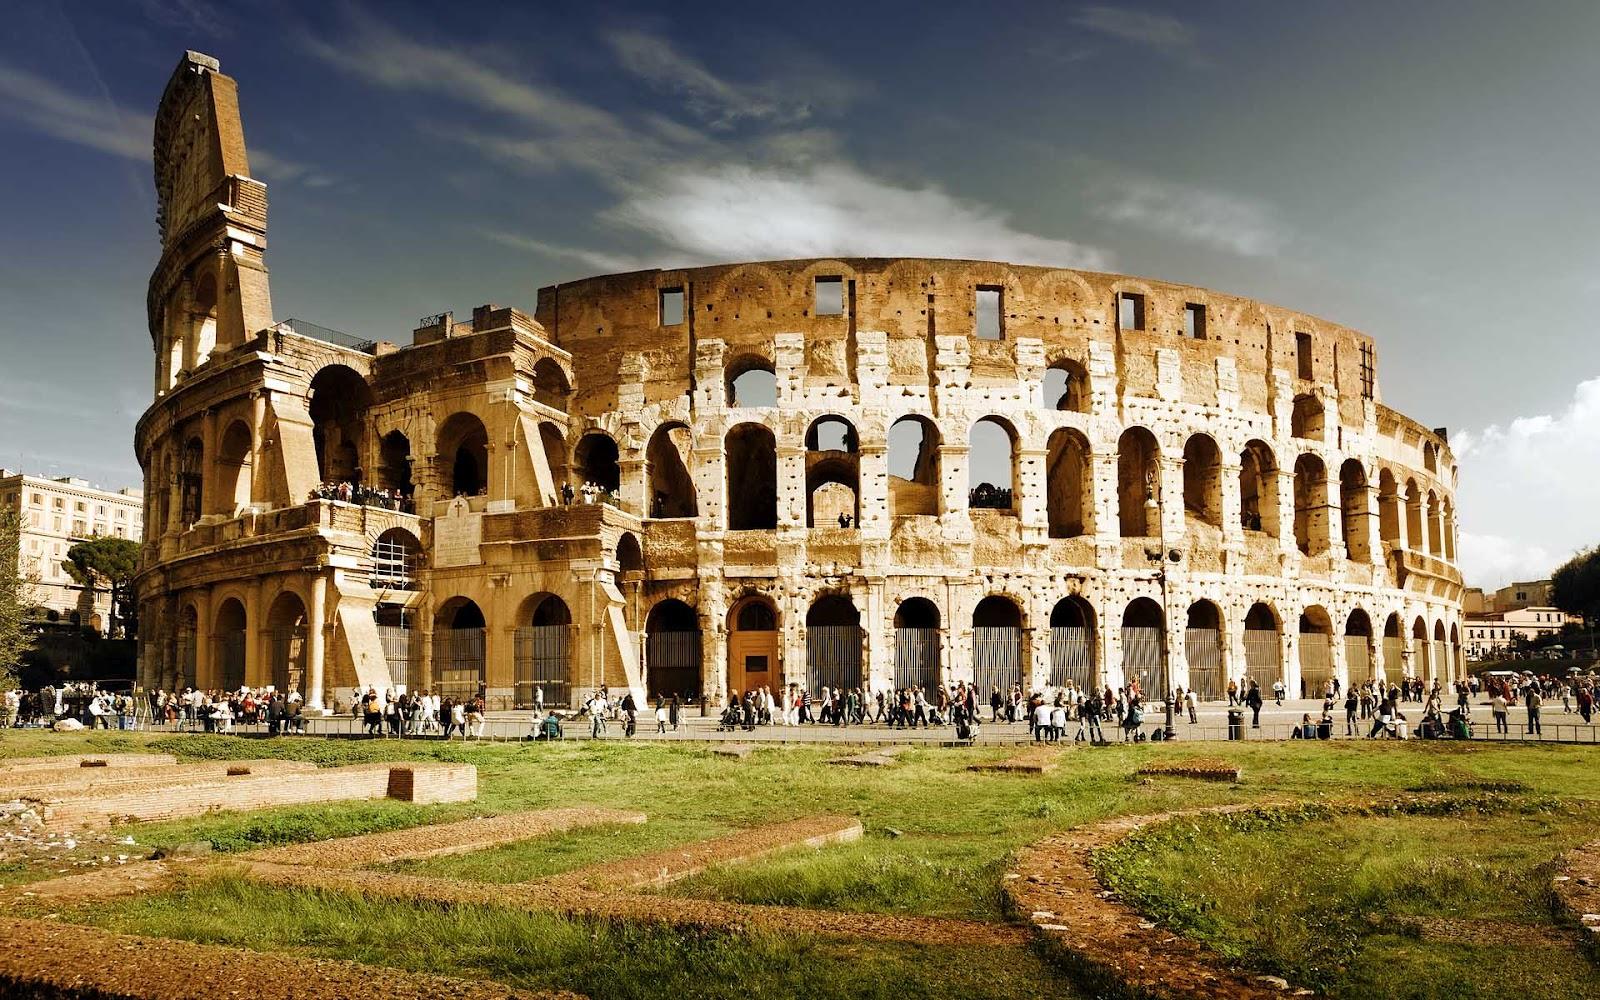 http://4.bp.blogspot.com/-f-FxmLEpk3c/UFSyt4YV8YI/AAAAAAAAB9M/QQ_CoLXO4UI/s1600/hd-gebouwen-achtergrond-met-het-colosseum-in-de-stad-rome-italie-gebouw-wallpaper-foto.jpg